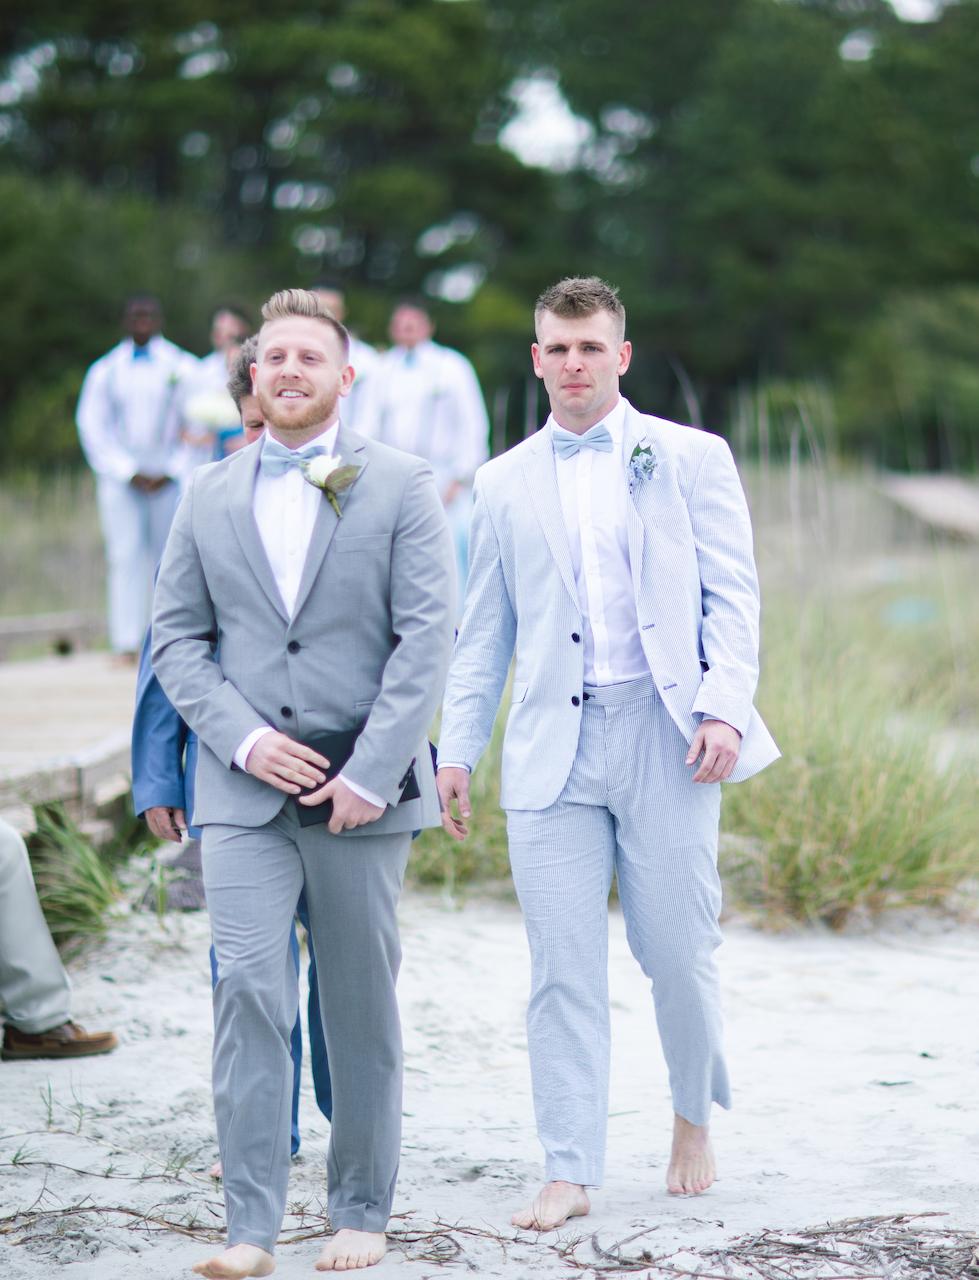 hilton-head-island-wedding-sc-ceremony6.jpg